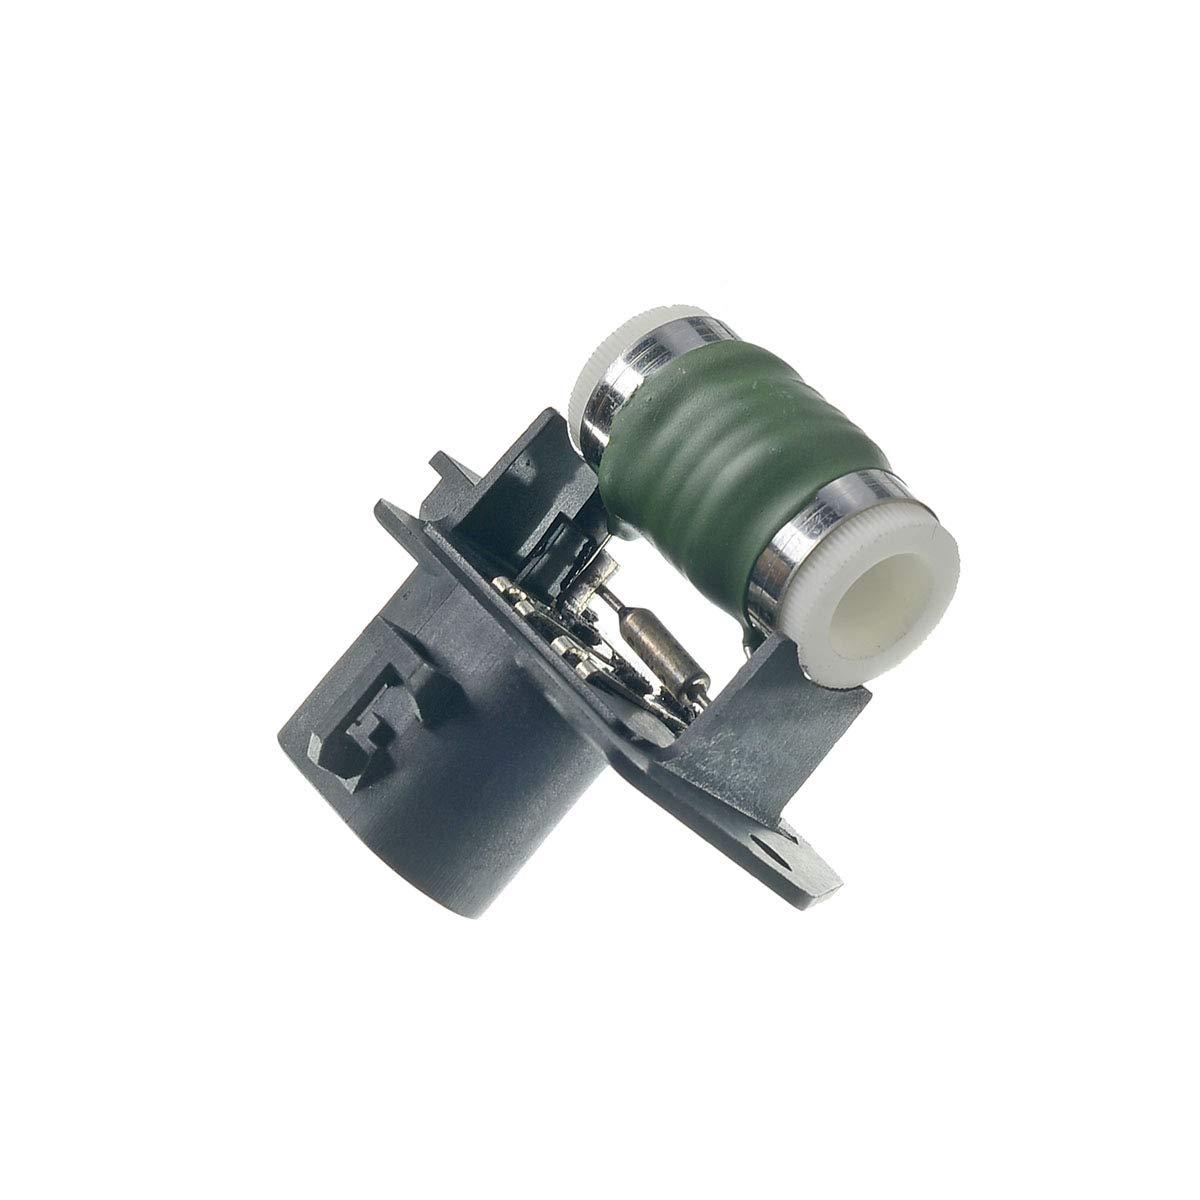 2018 55722780 Regulador de ventilador interior para Doblo 119 500 312 Bravo II 198 KA RU8 Corsa D 2006